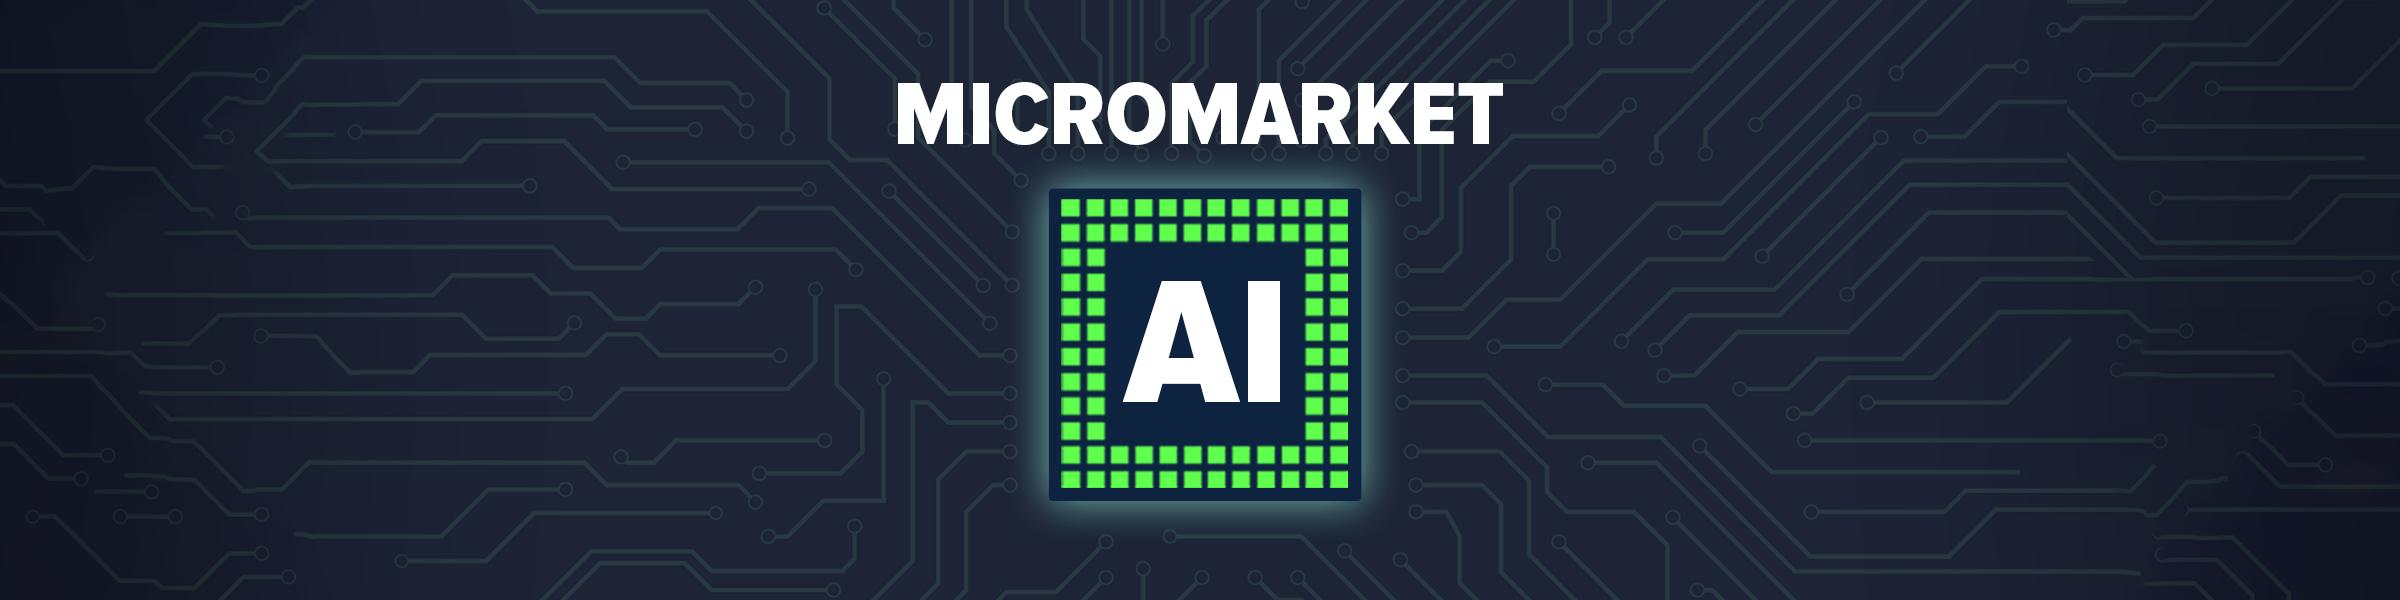 MicroMarket A.I. Press Release Header